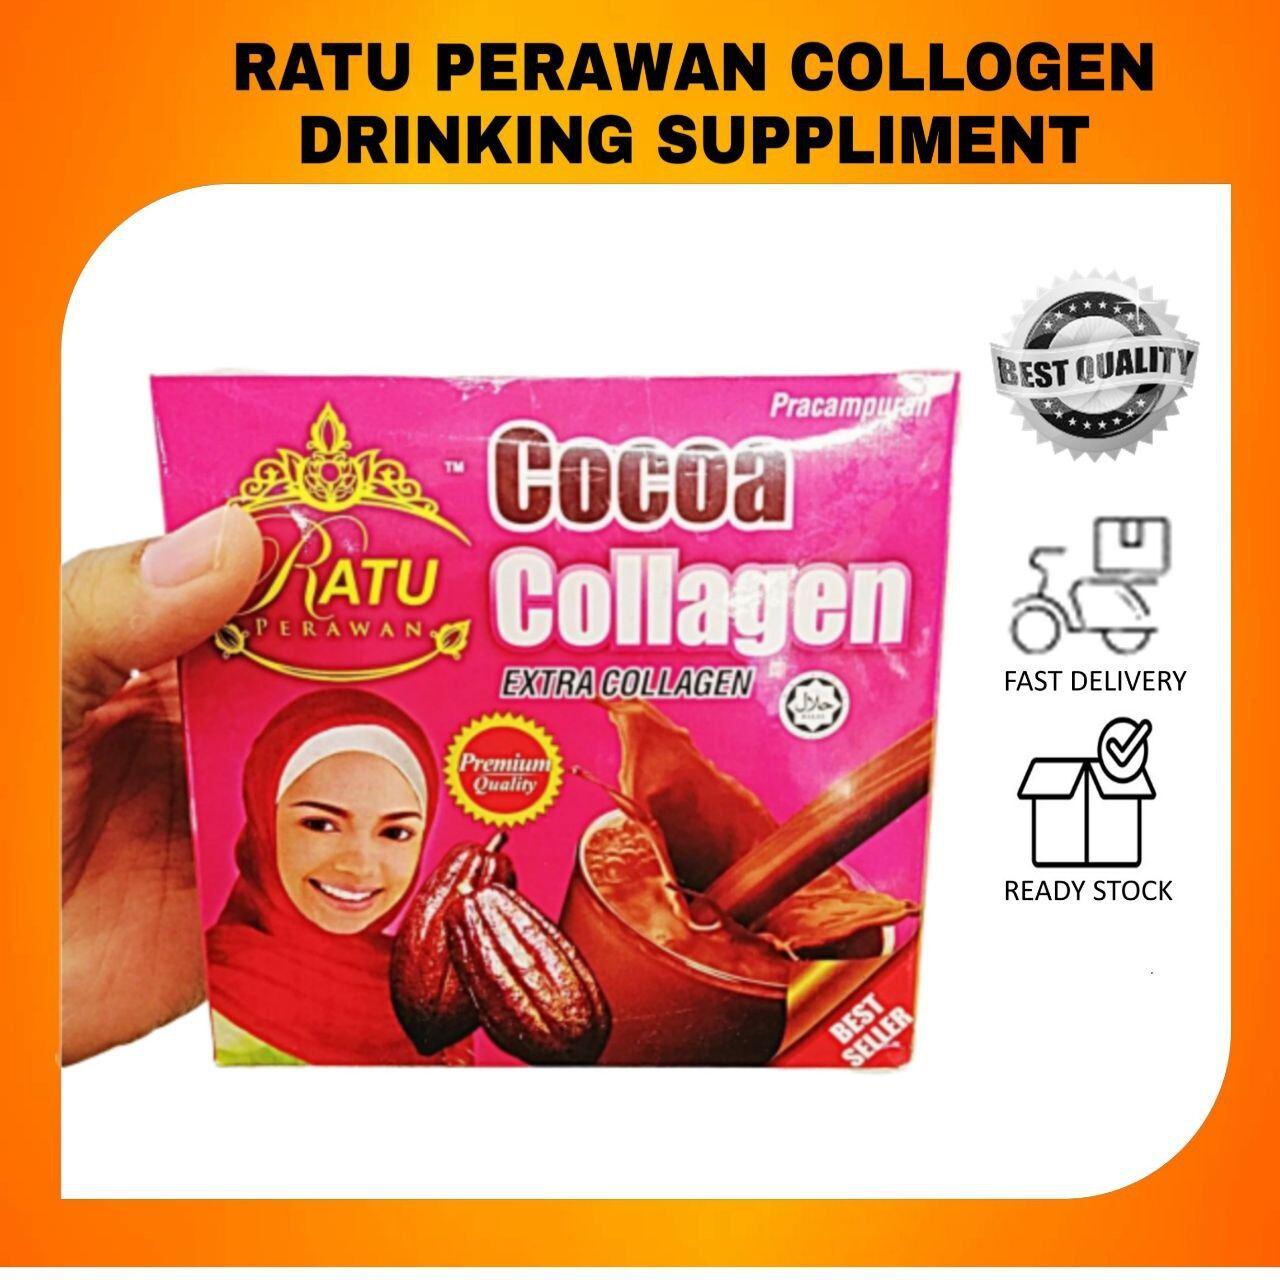 ORIGINAL RATU PERAWAN COCOA COLLAGEN